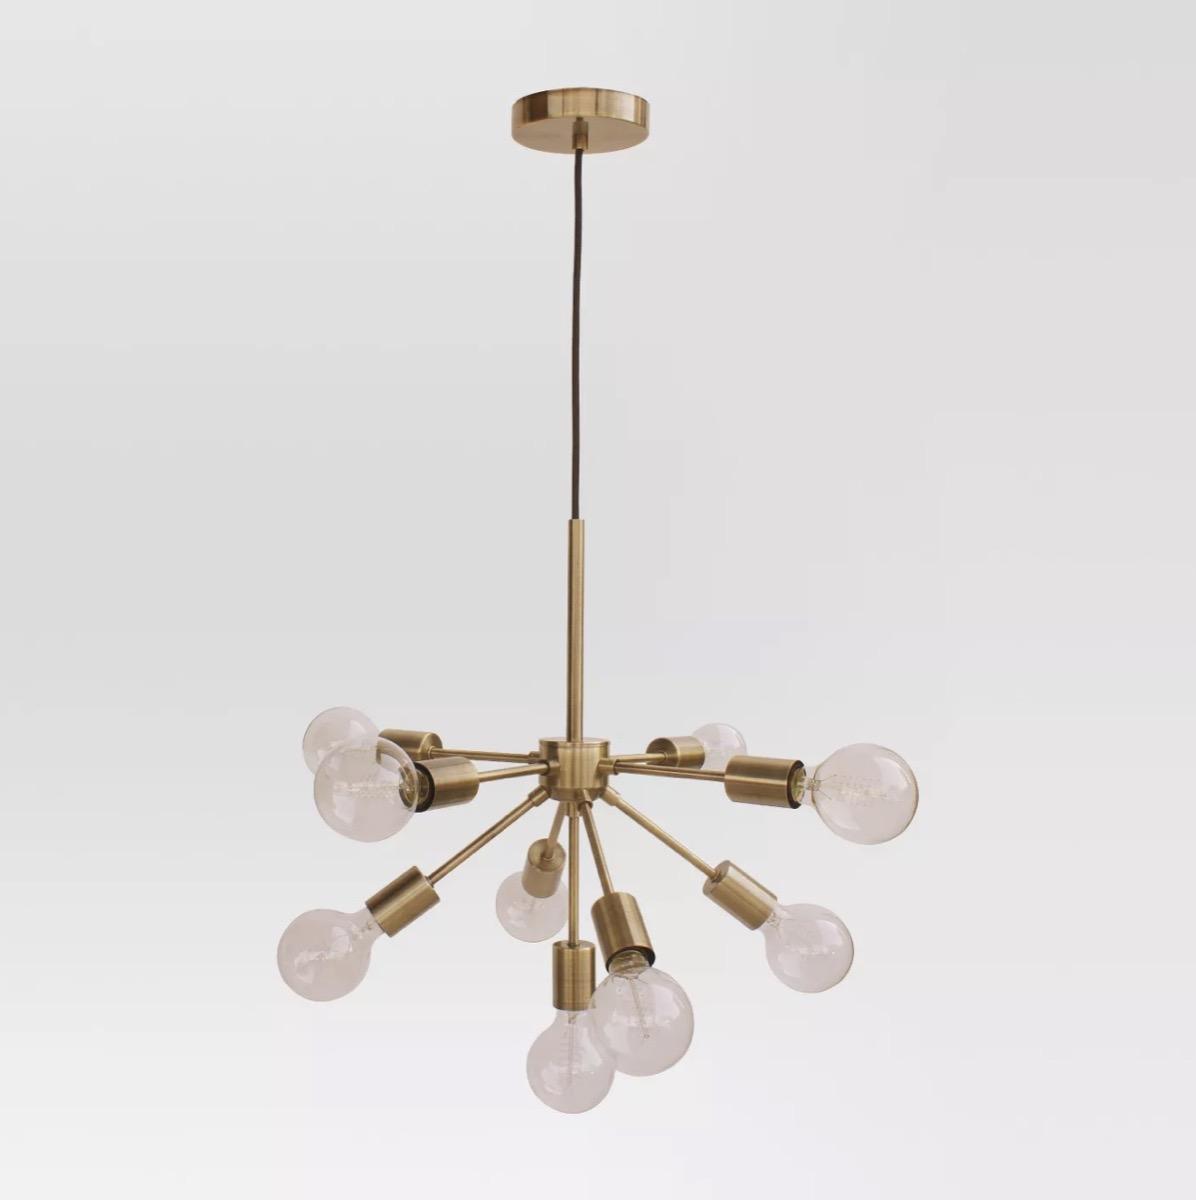 multi-armed brass chandelier, target home decor items